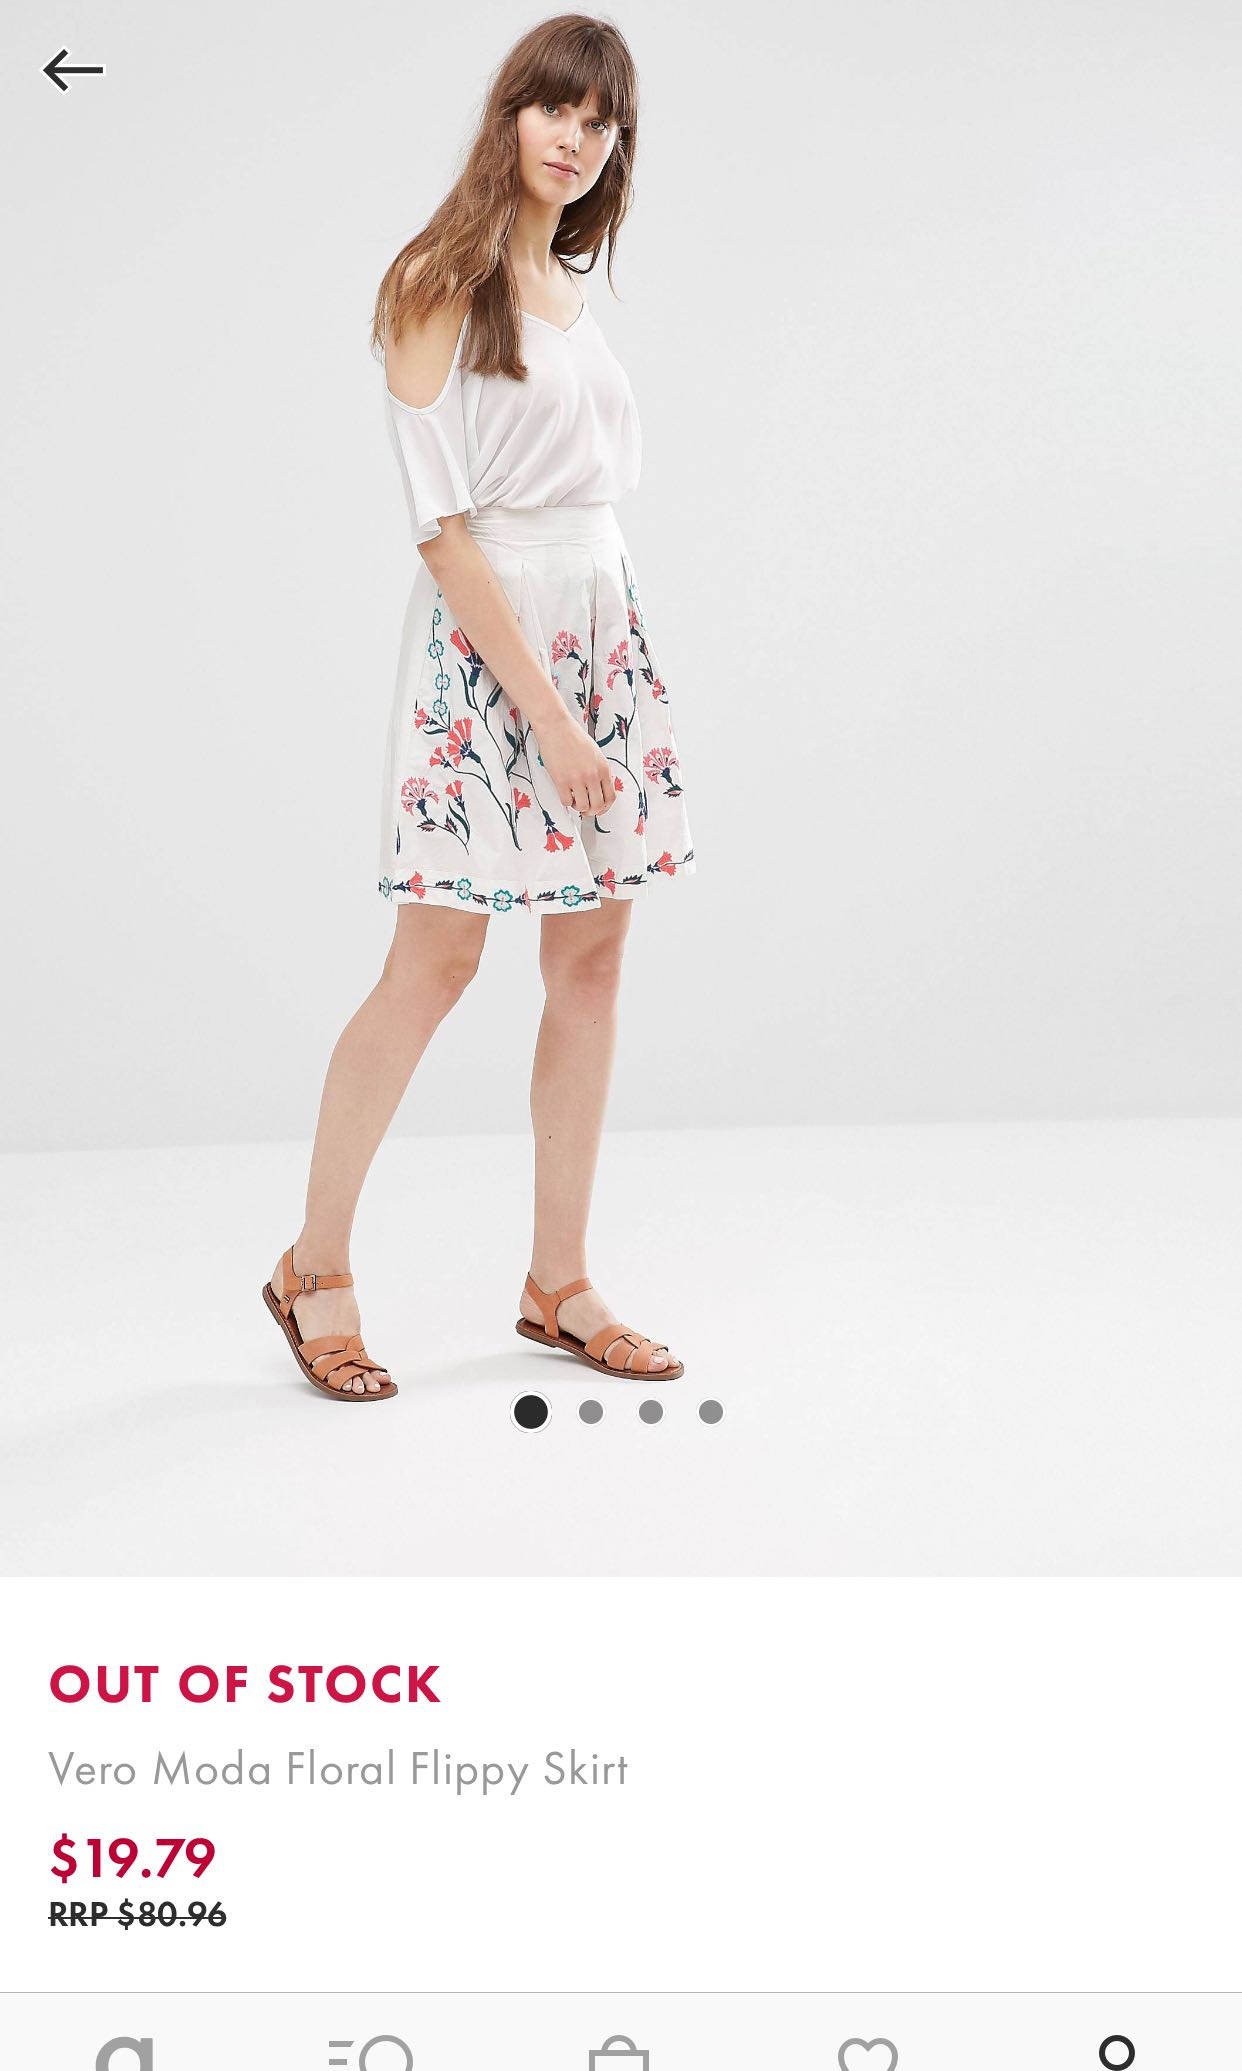 7fc25c77b0 Vero Moda floral flippy skirt, Women's Fashion, Clothes, Dresses ...